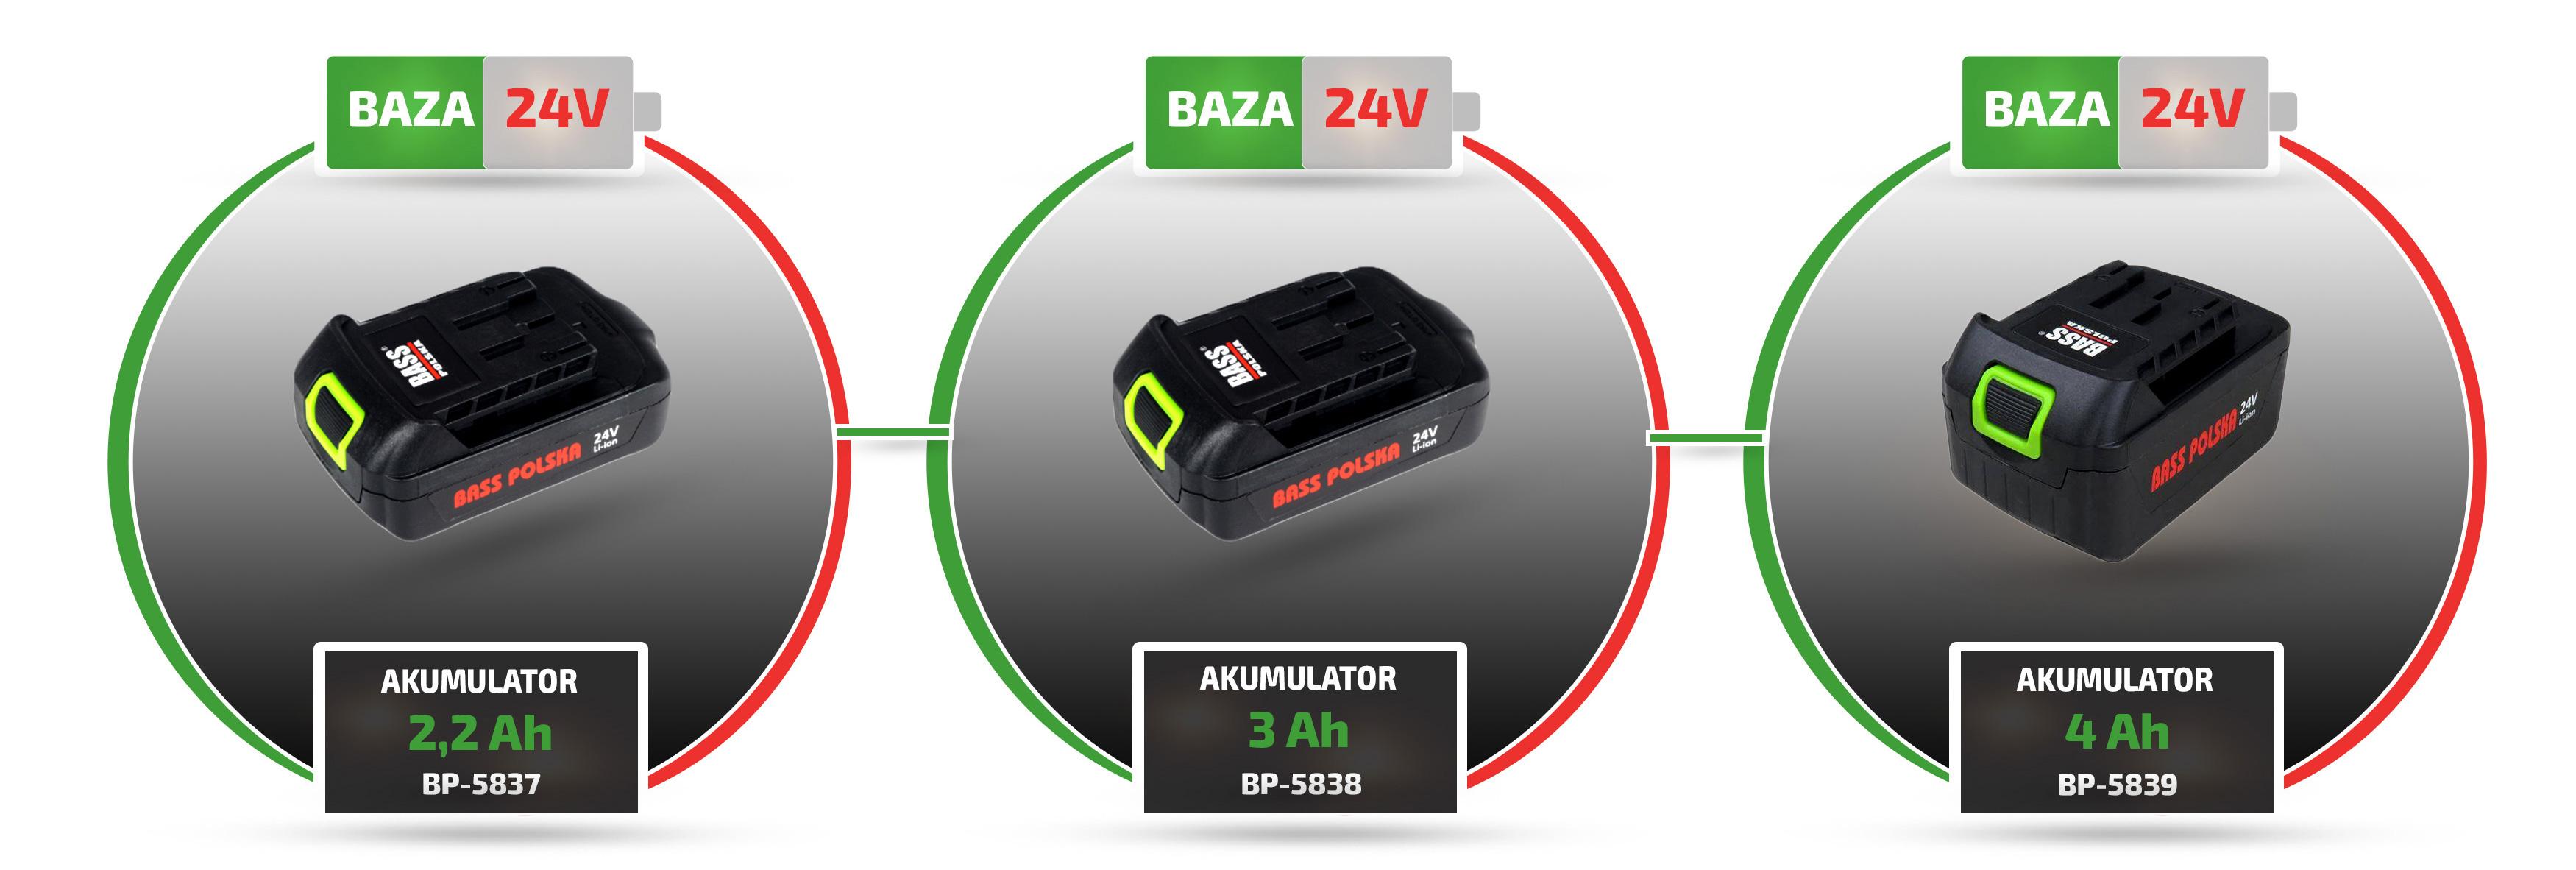 Akumulatory do narzędzi 24V z jednej bazy